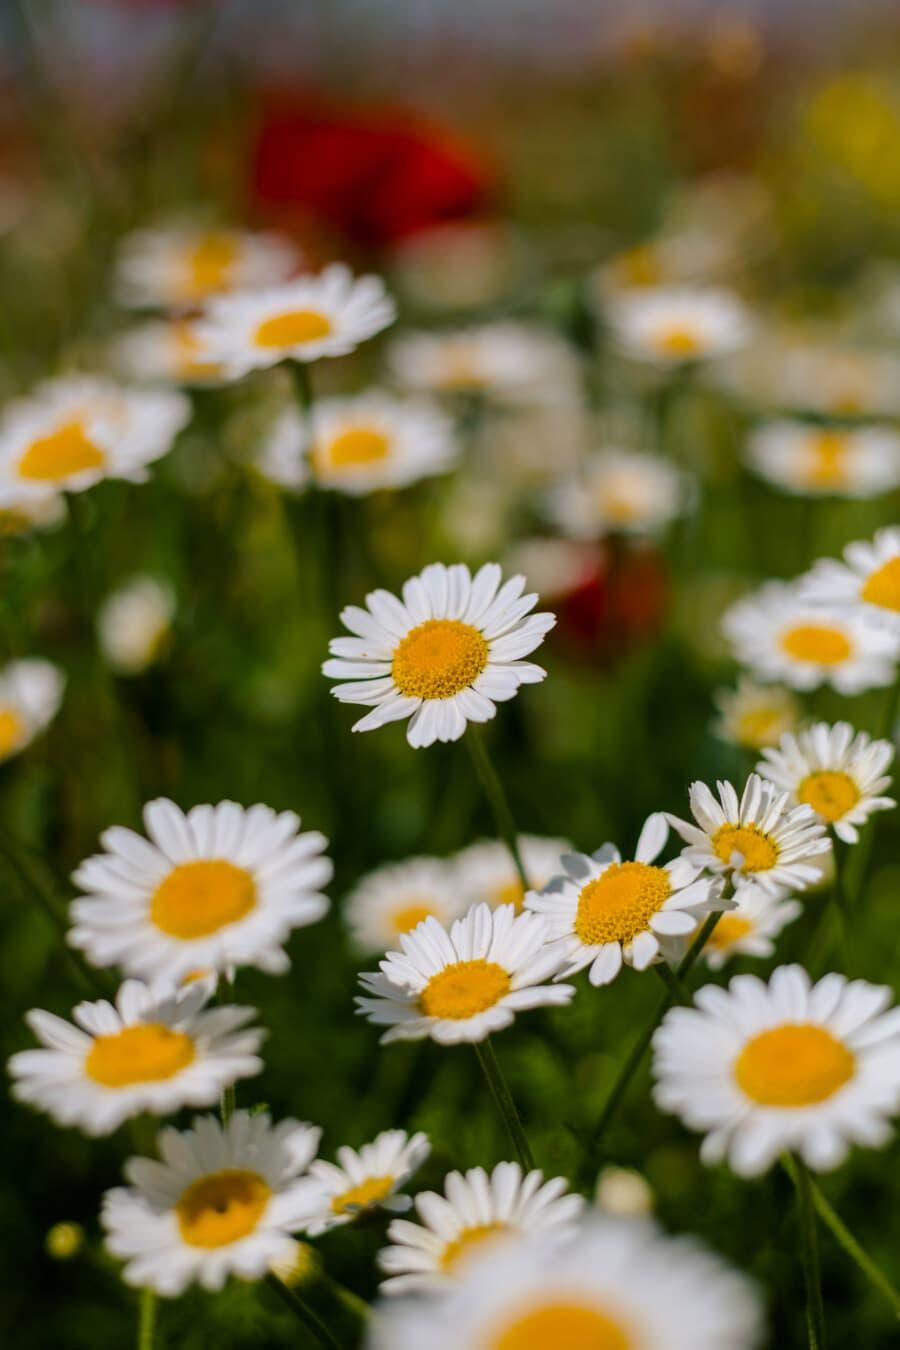 chamomile, white flower, grass, wildlife, meadow, wildflower, detail, greenish yellow, close-up, herb